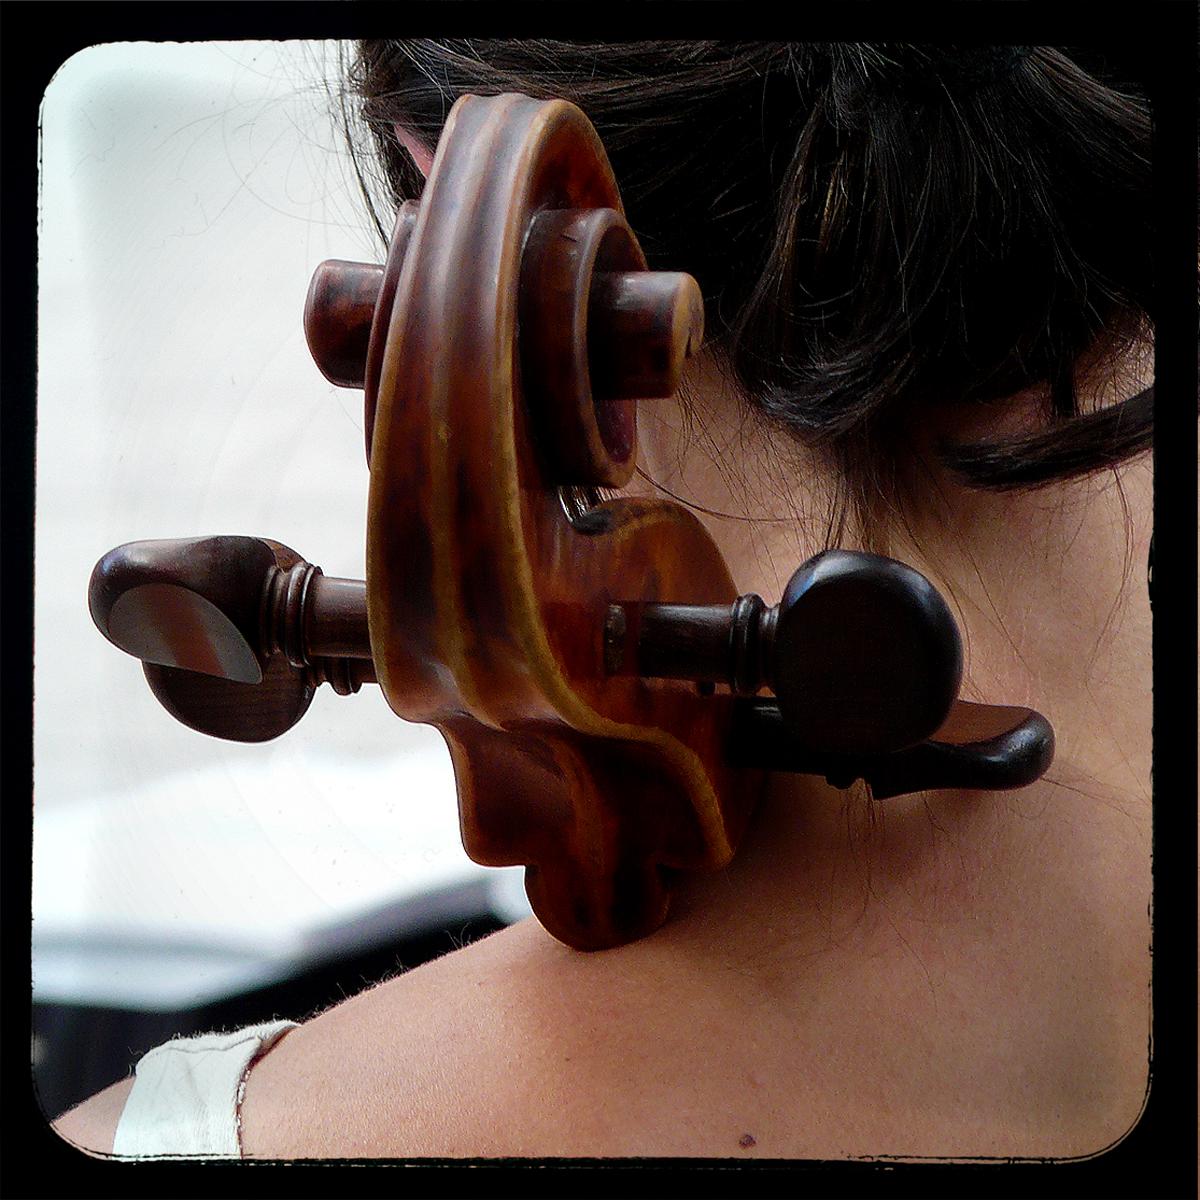 A Cellist in the Street